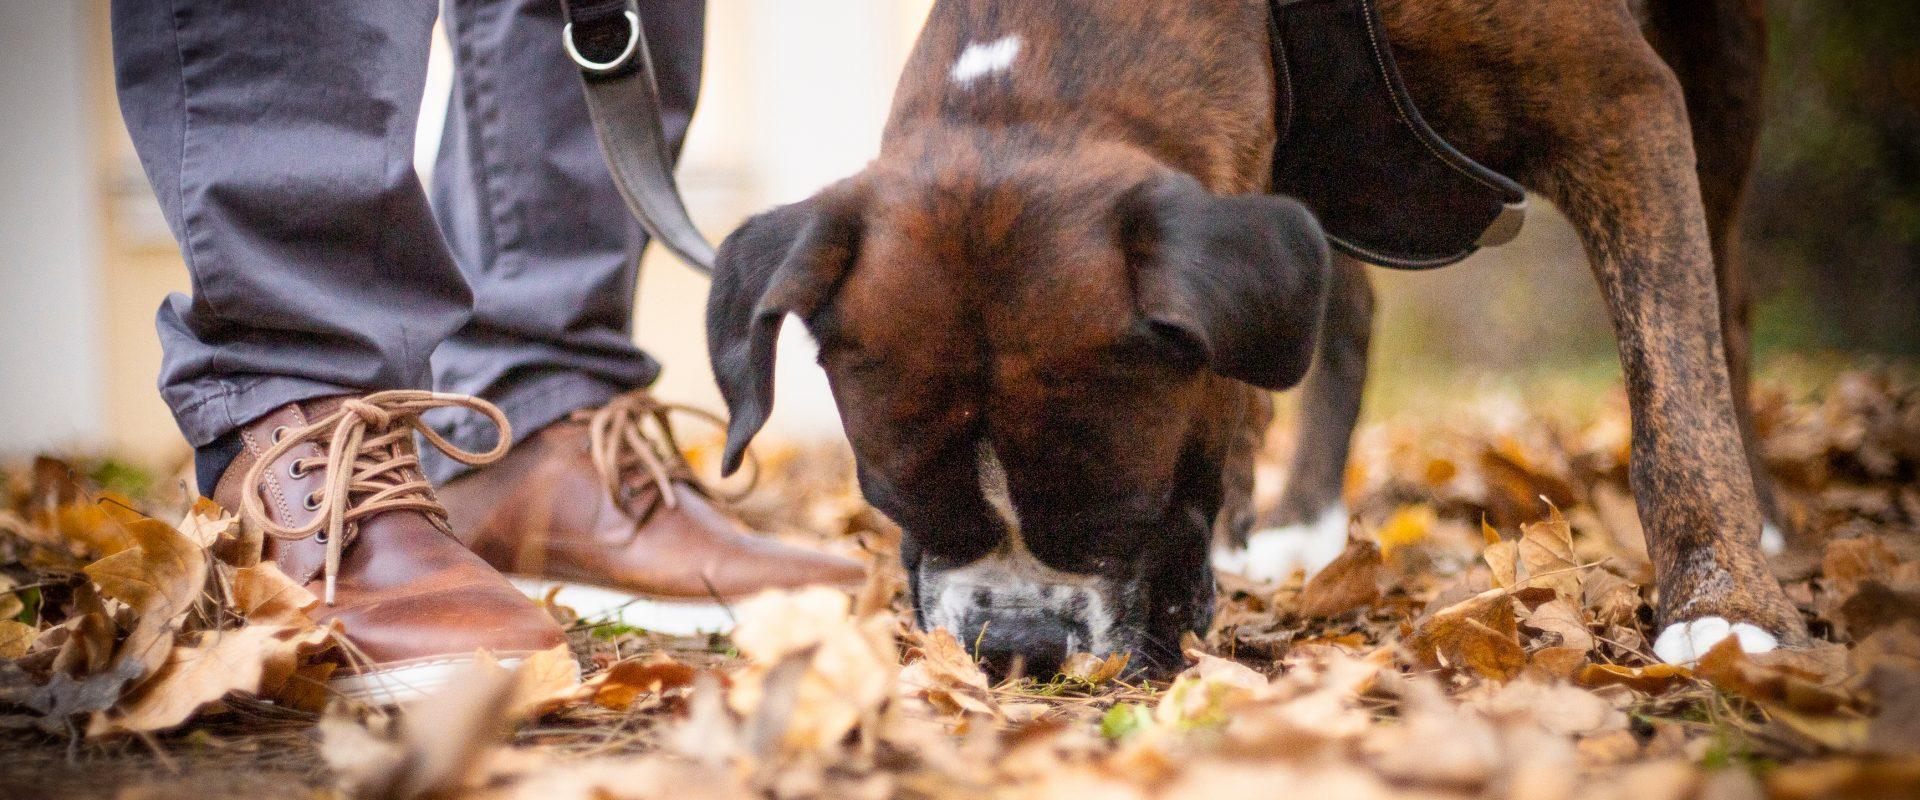 Willkommen bei den FellRebellen - Hundetraining und Beratung